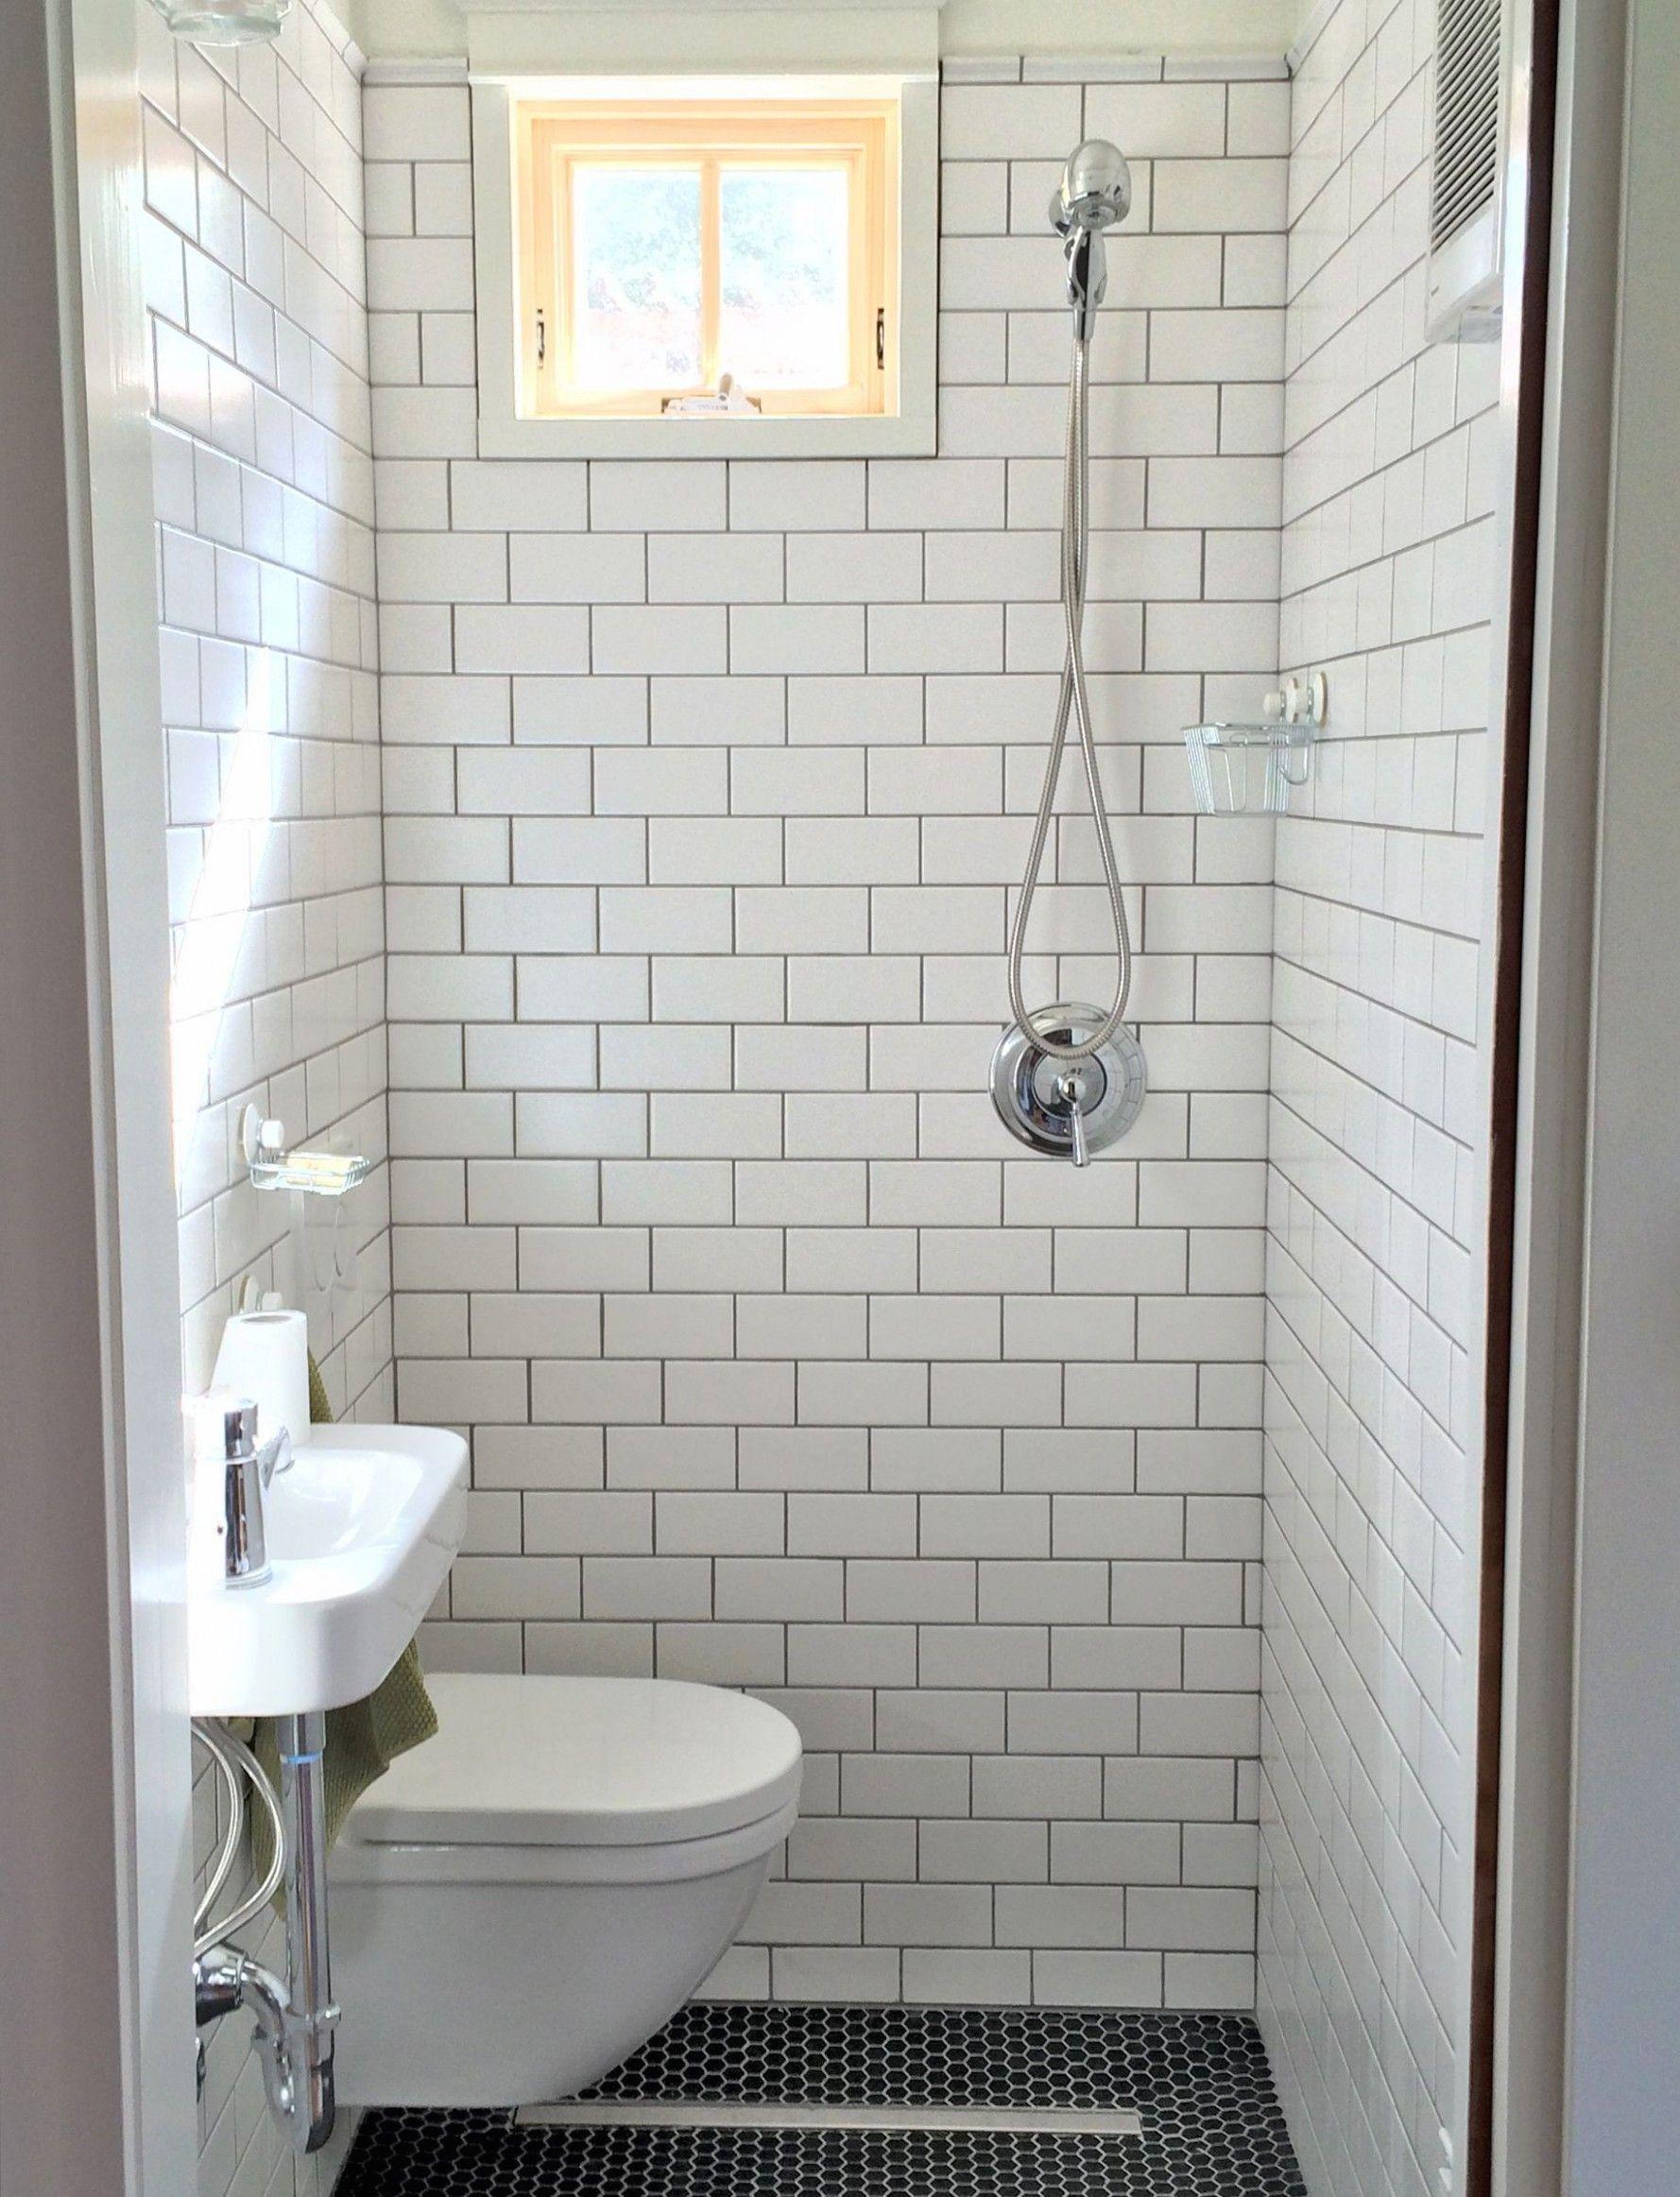 Narrow Bathroom Ideas With Shower 1000 Small Shower Room Wet Bathroom Ideas Tiny Bathrooms